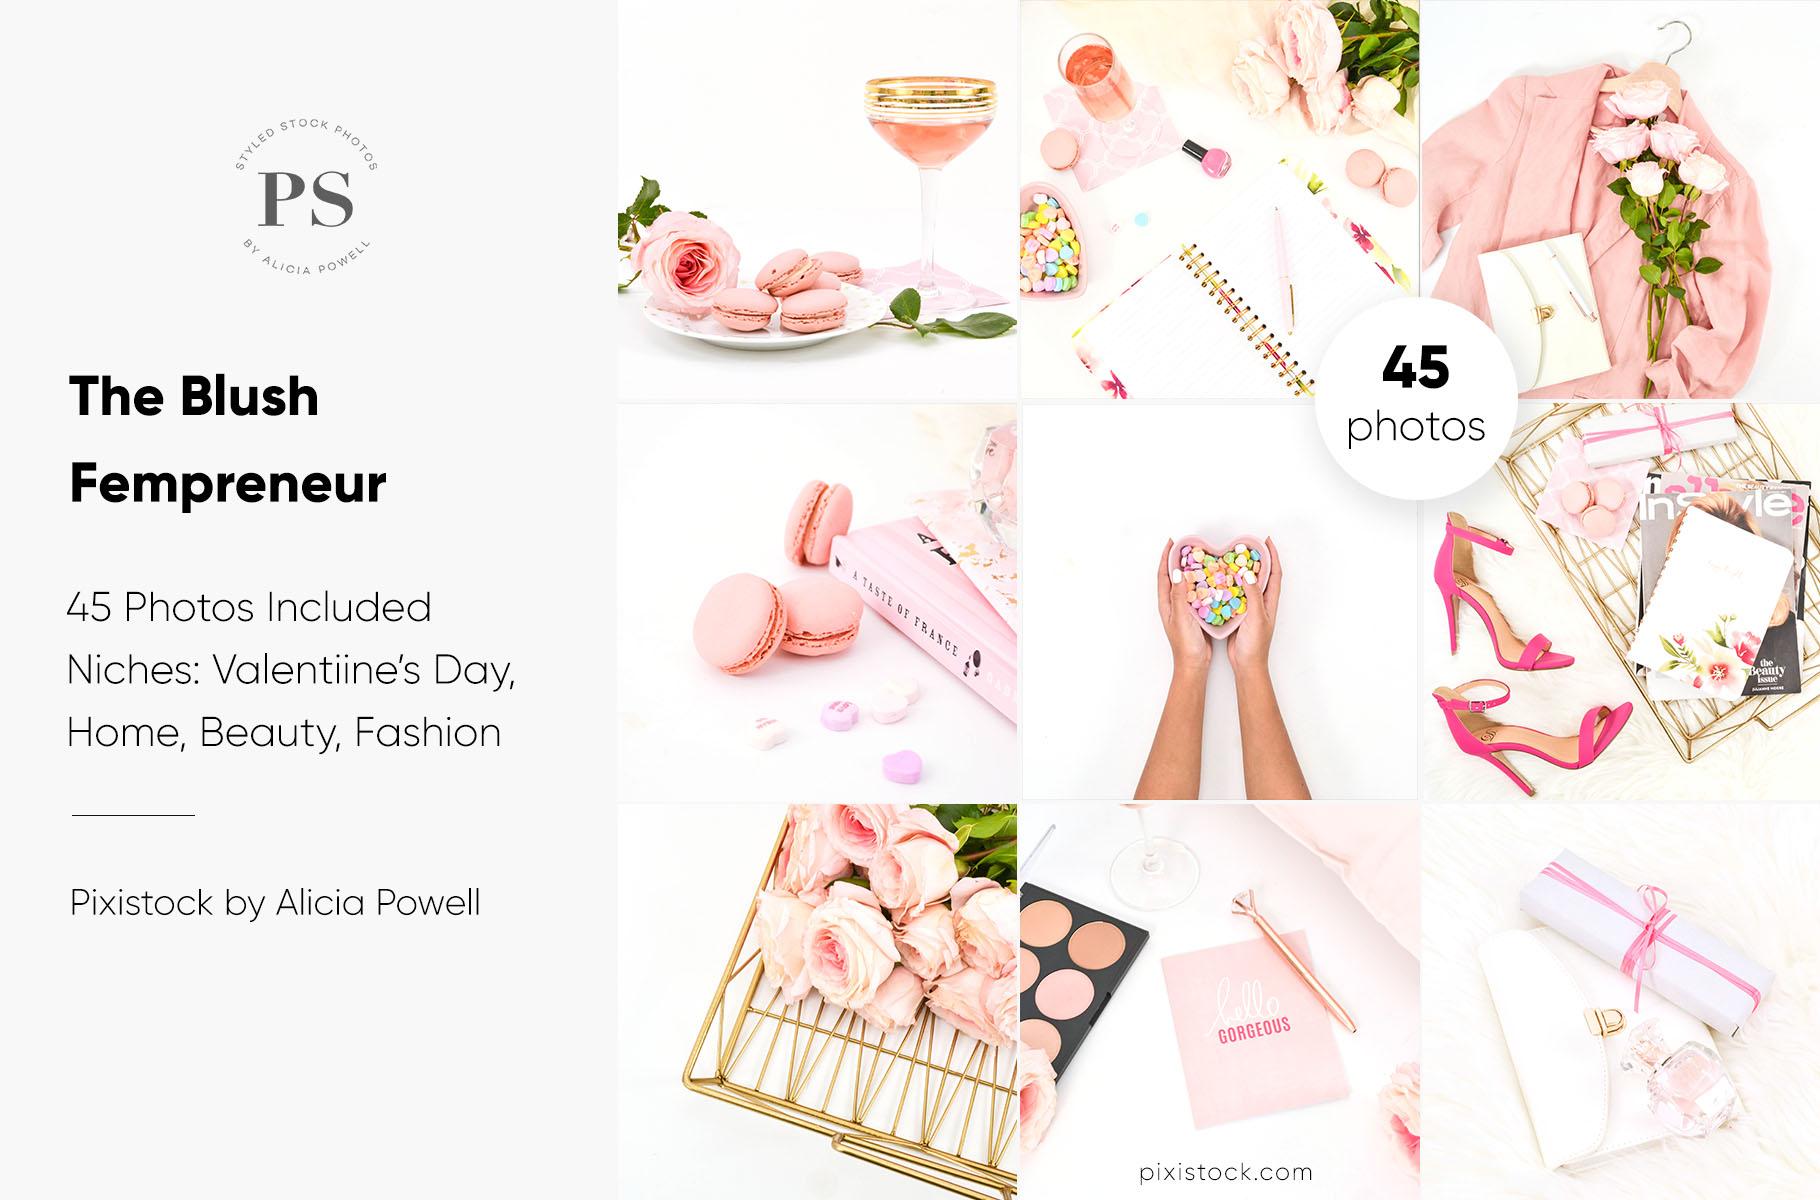 Blush Fempreneur Stock Photo Collection